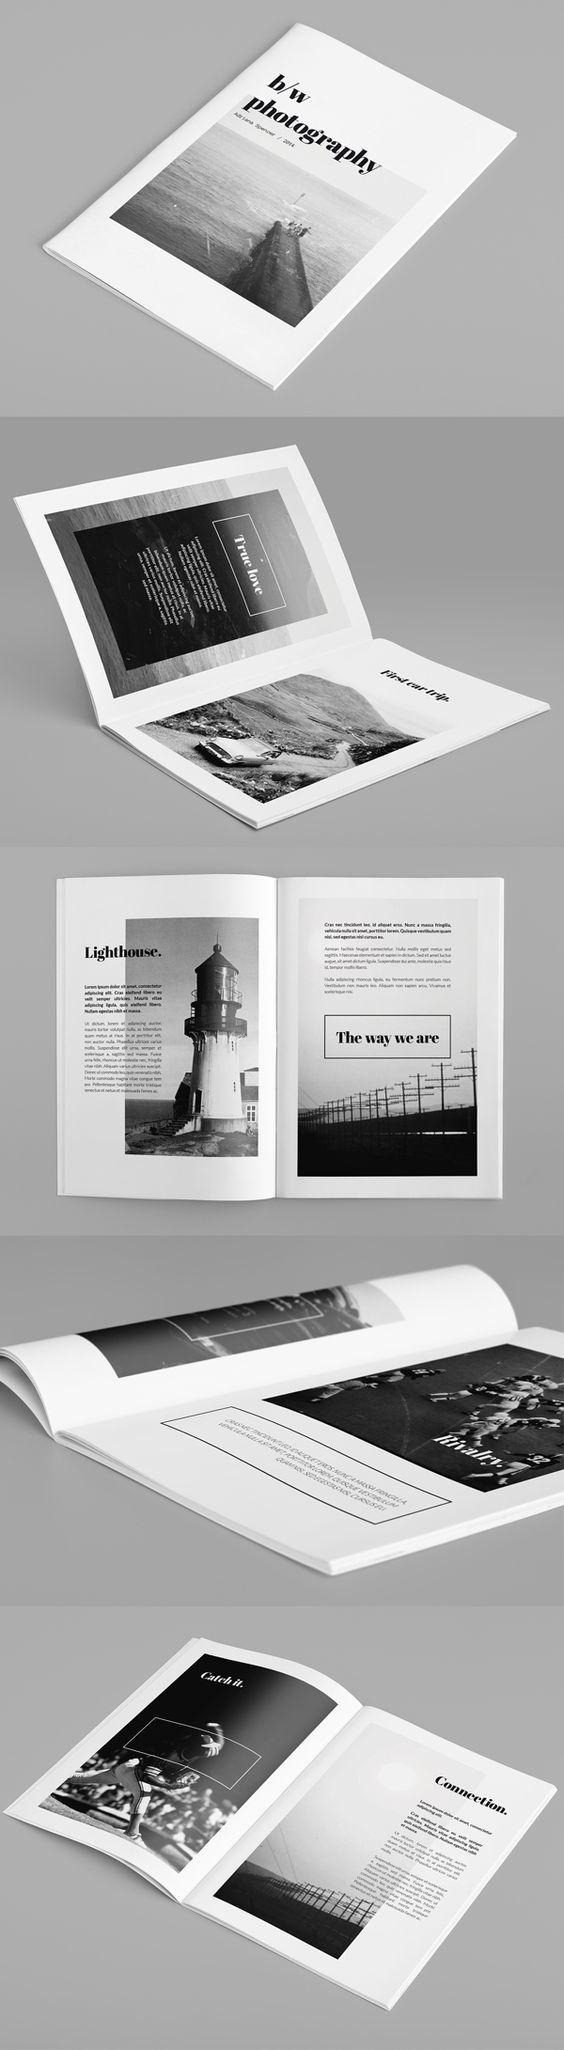 Minimal Photography Portfolio Brochure by Rounded Hexagon, via Behance